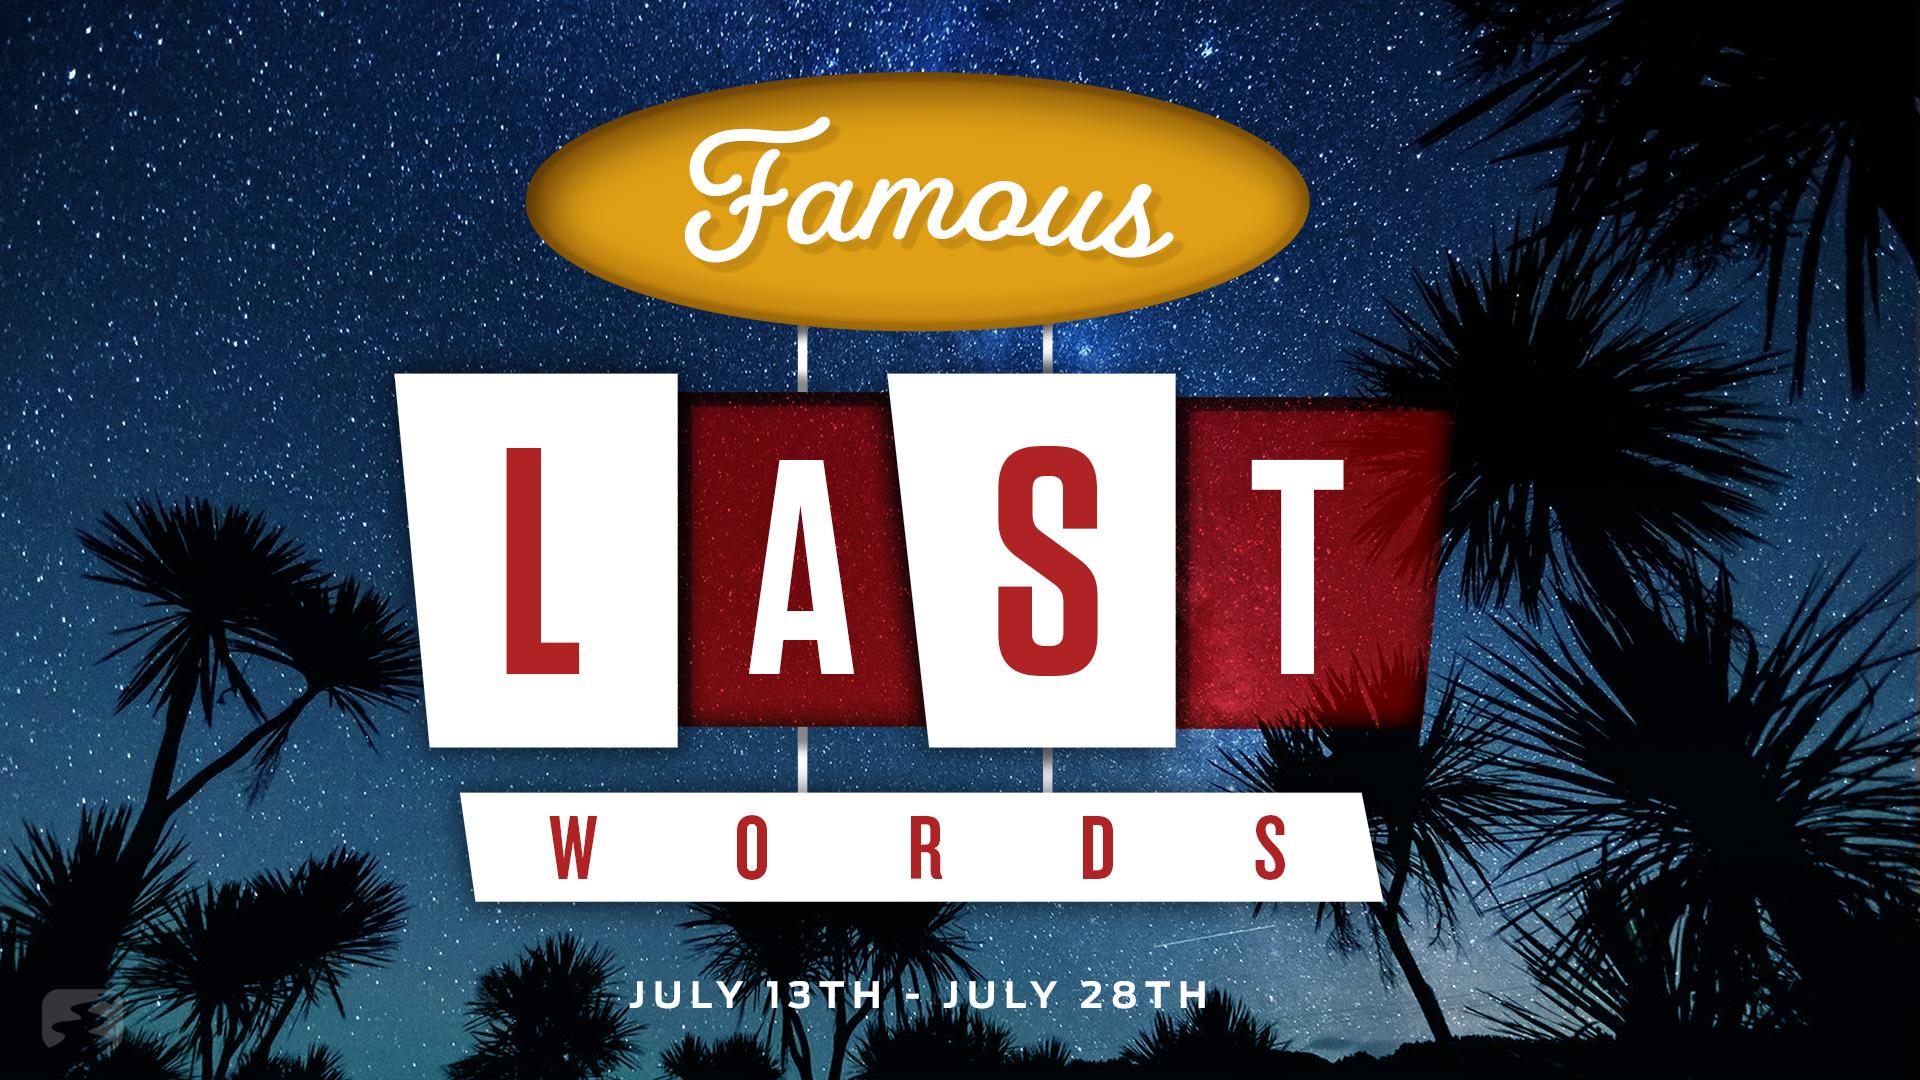 Famous Last Words Archives | The Journey